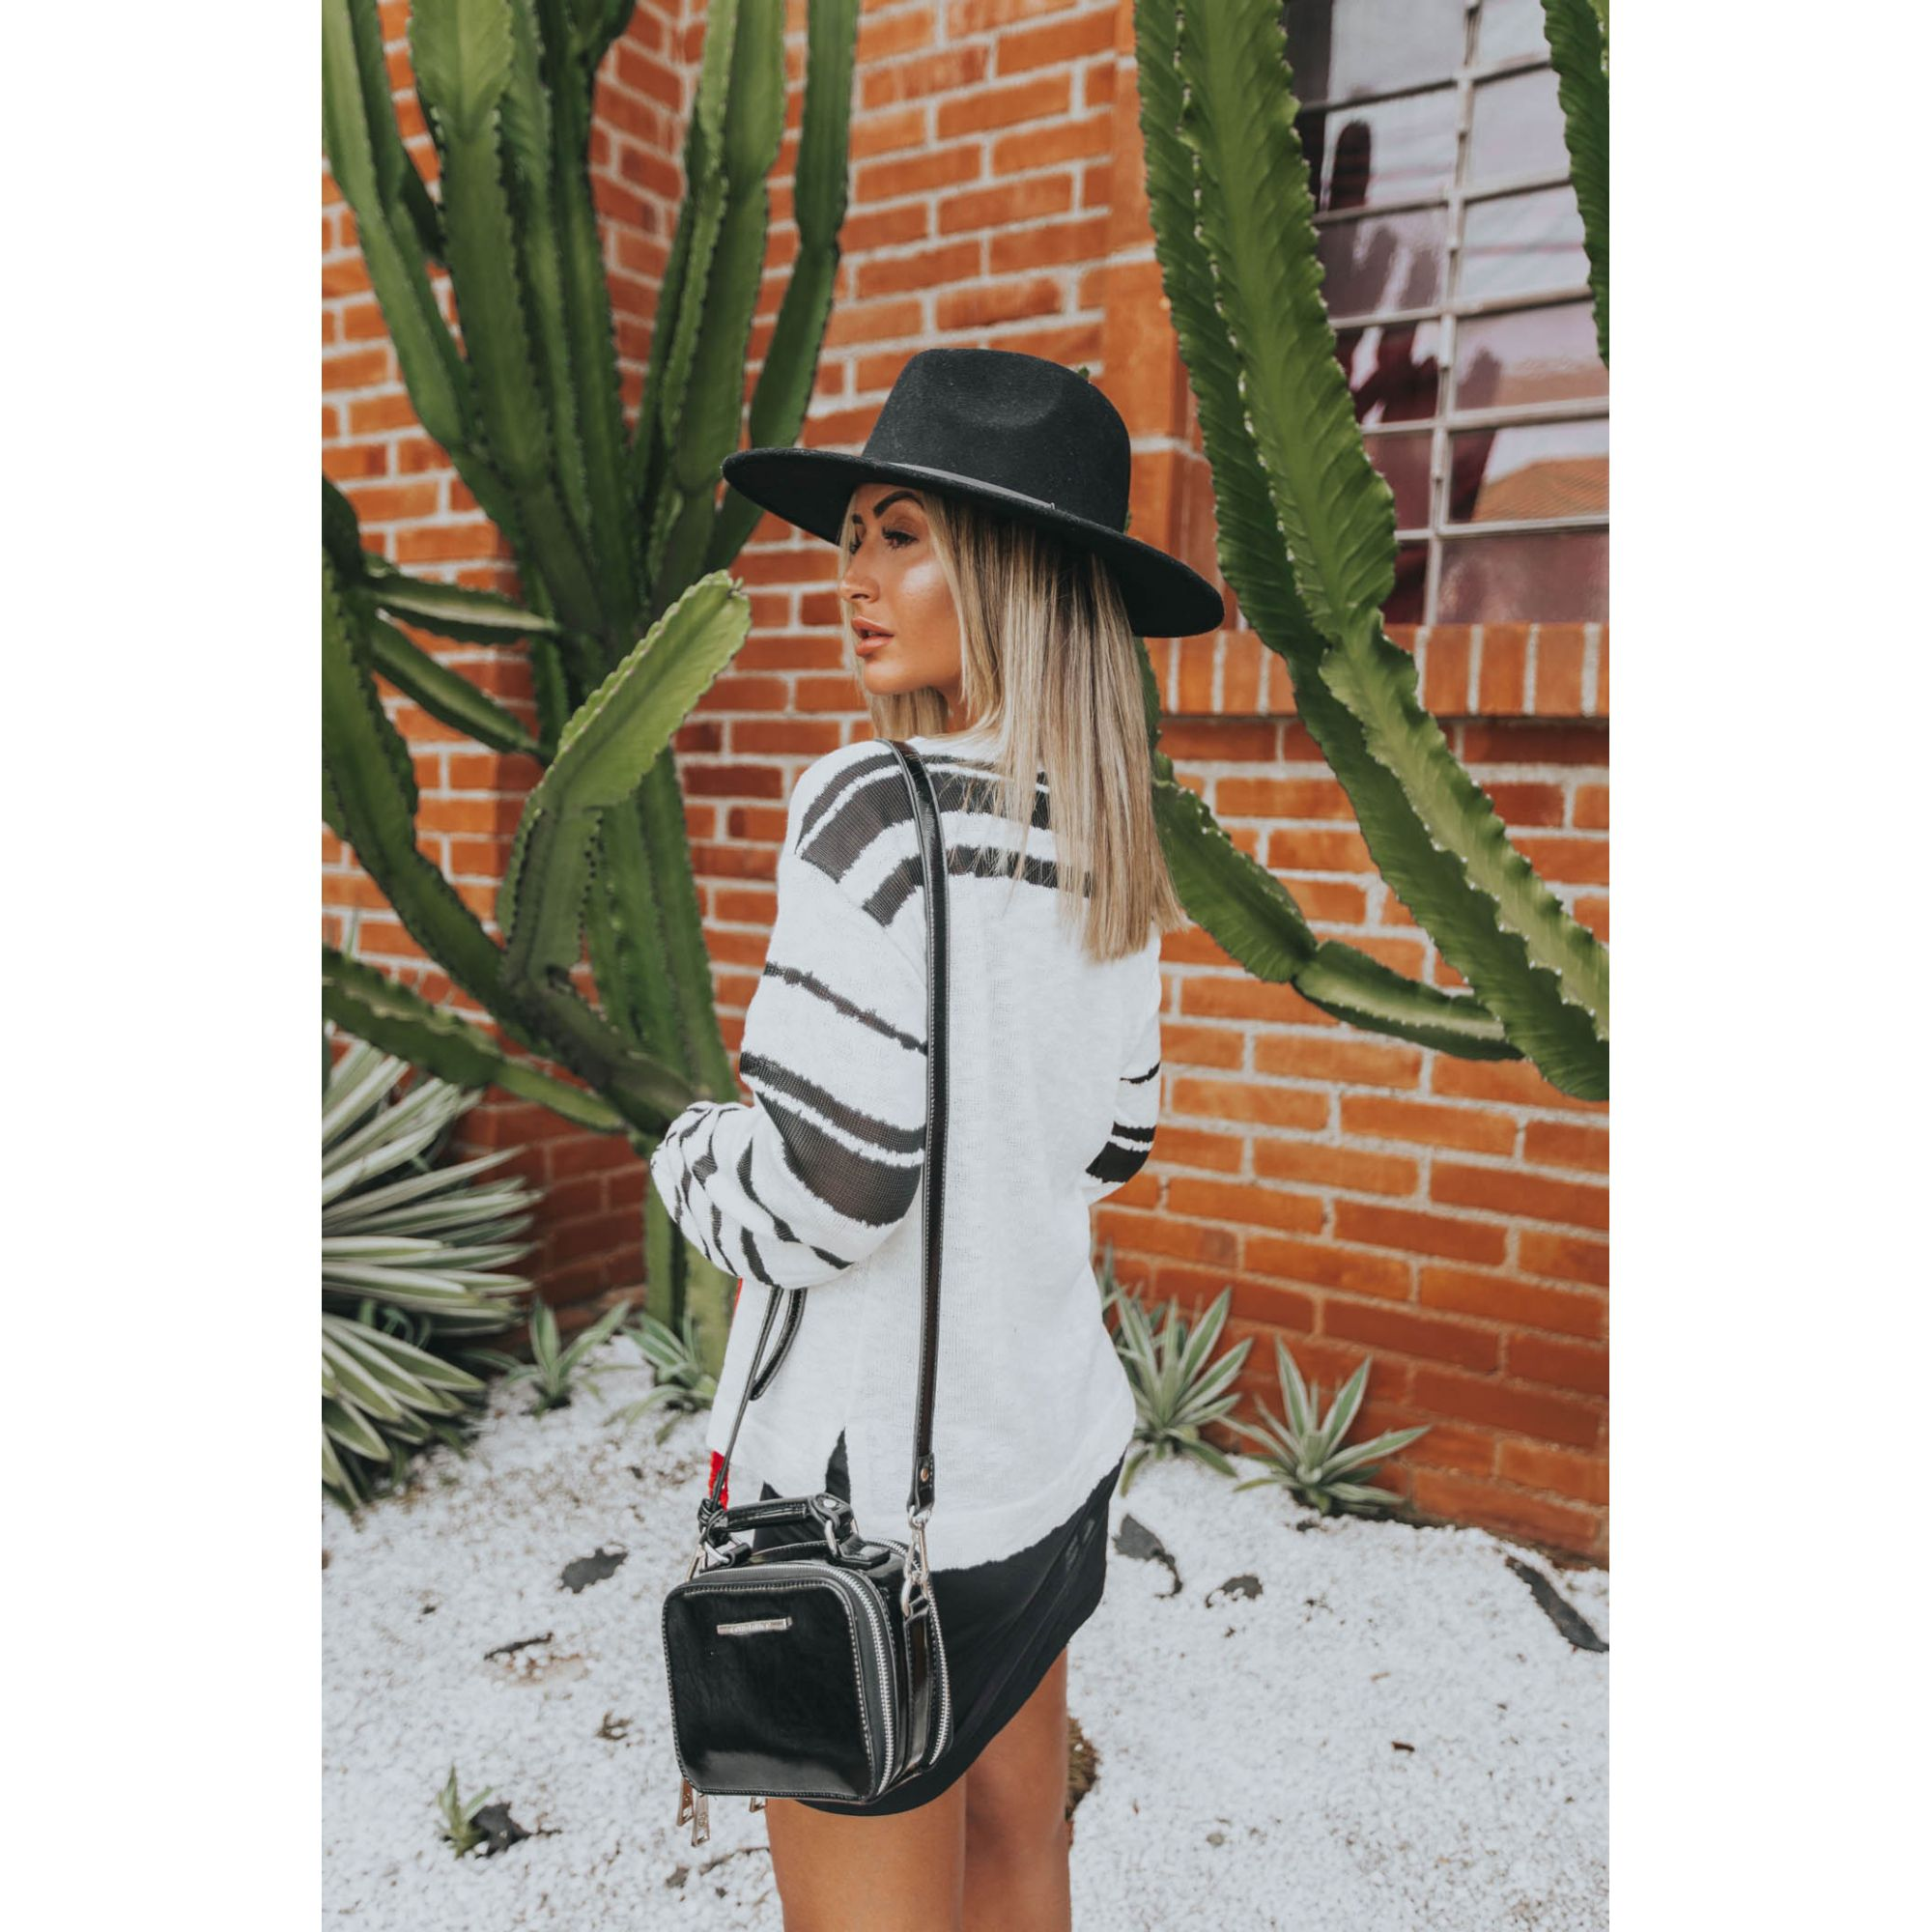 Blusa Vera Tricot Feminino Listras Off White / Preto Cordão Neon